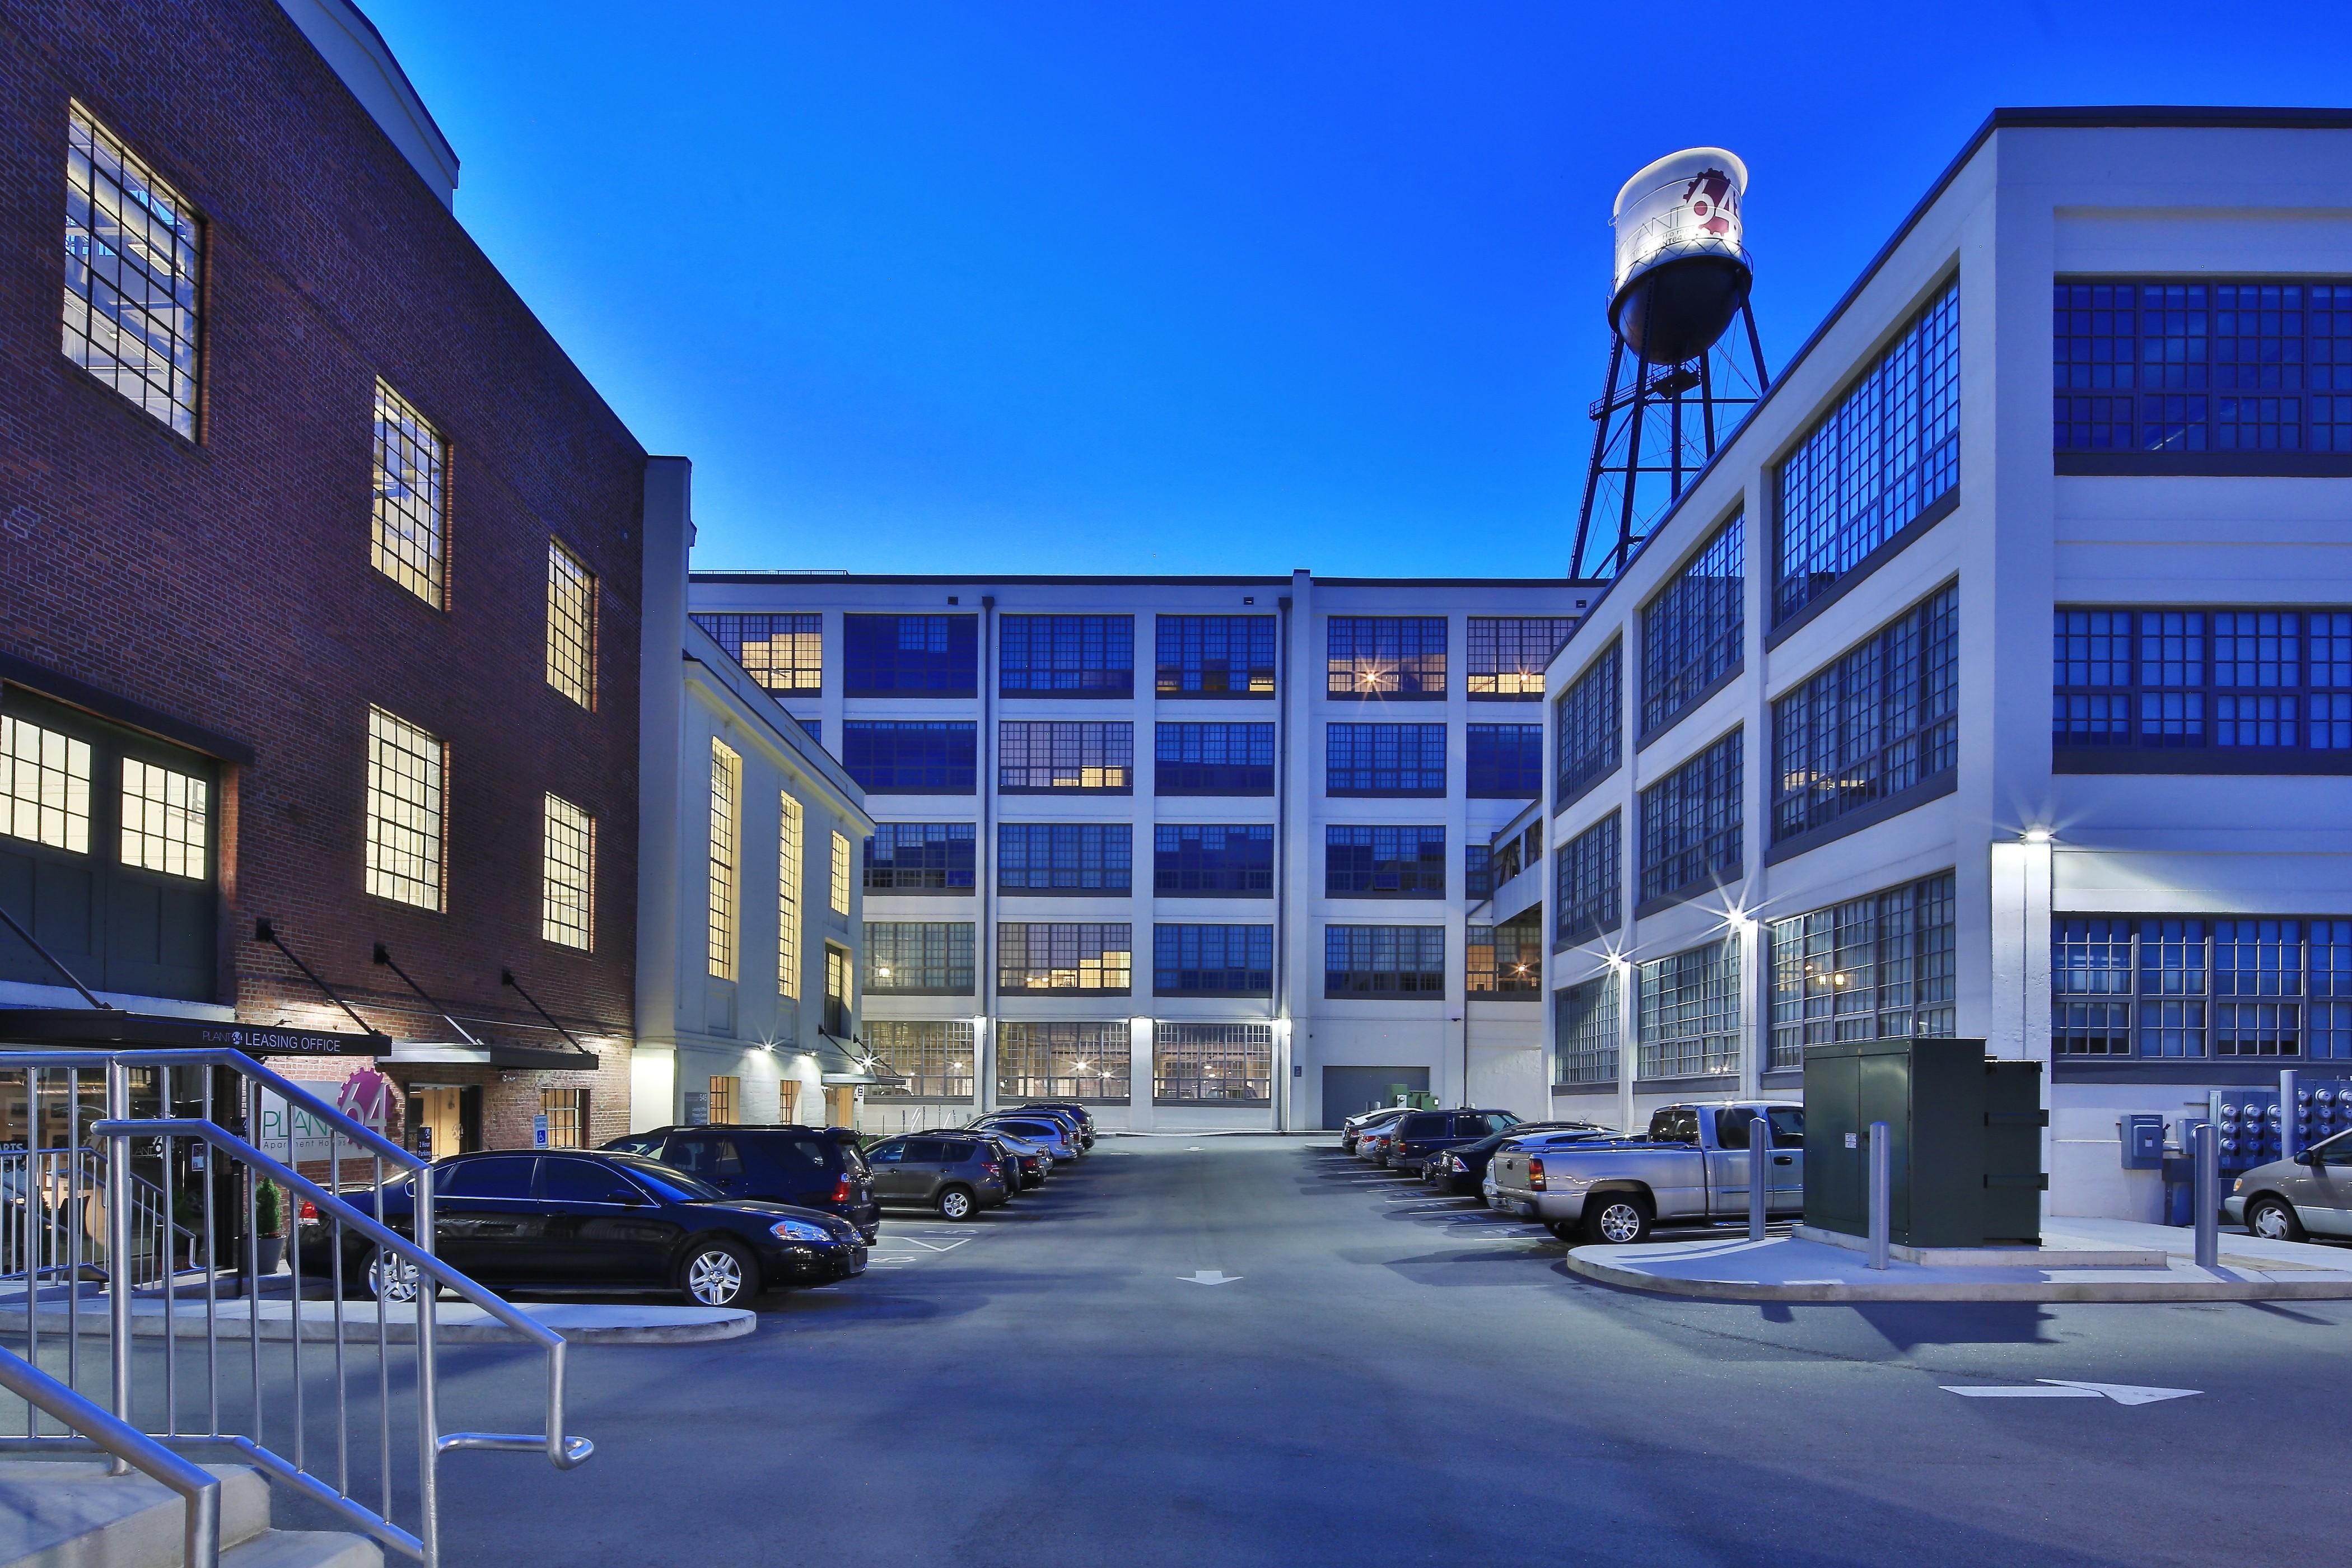 Apartments Near Winston Salem Plant 64 for Winston Salem Students in Winston Salem, NC